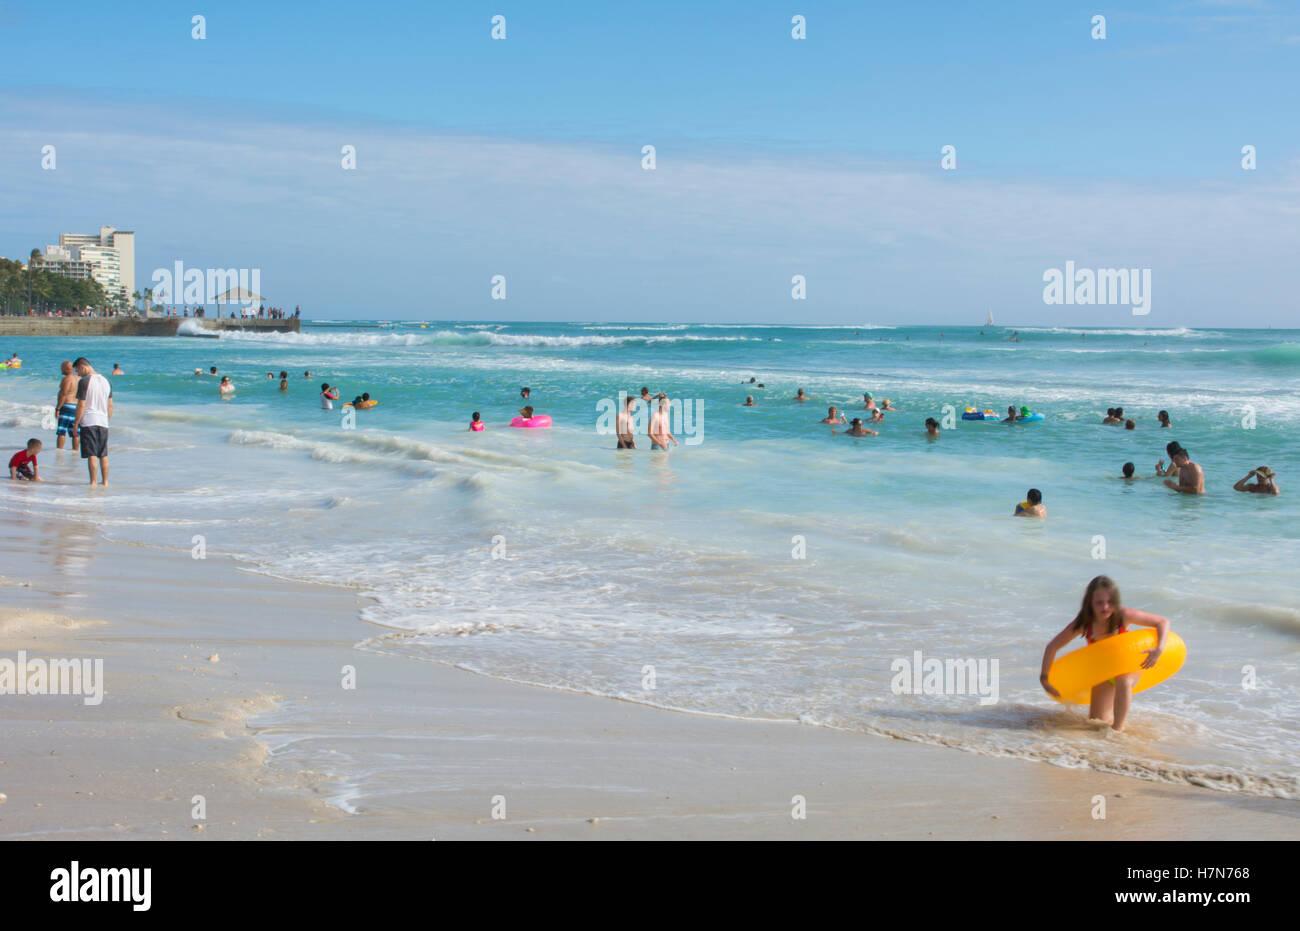 Honolulu Hawaii Oahu Waikiki Beach with tourists on wonderful beach with water and sand - Stock Image